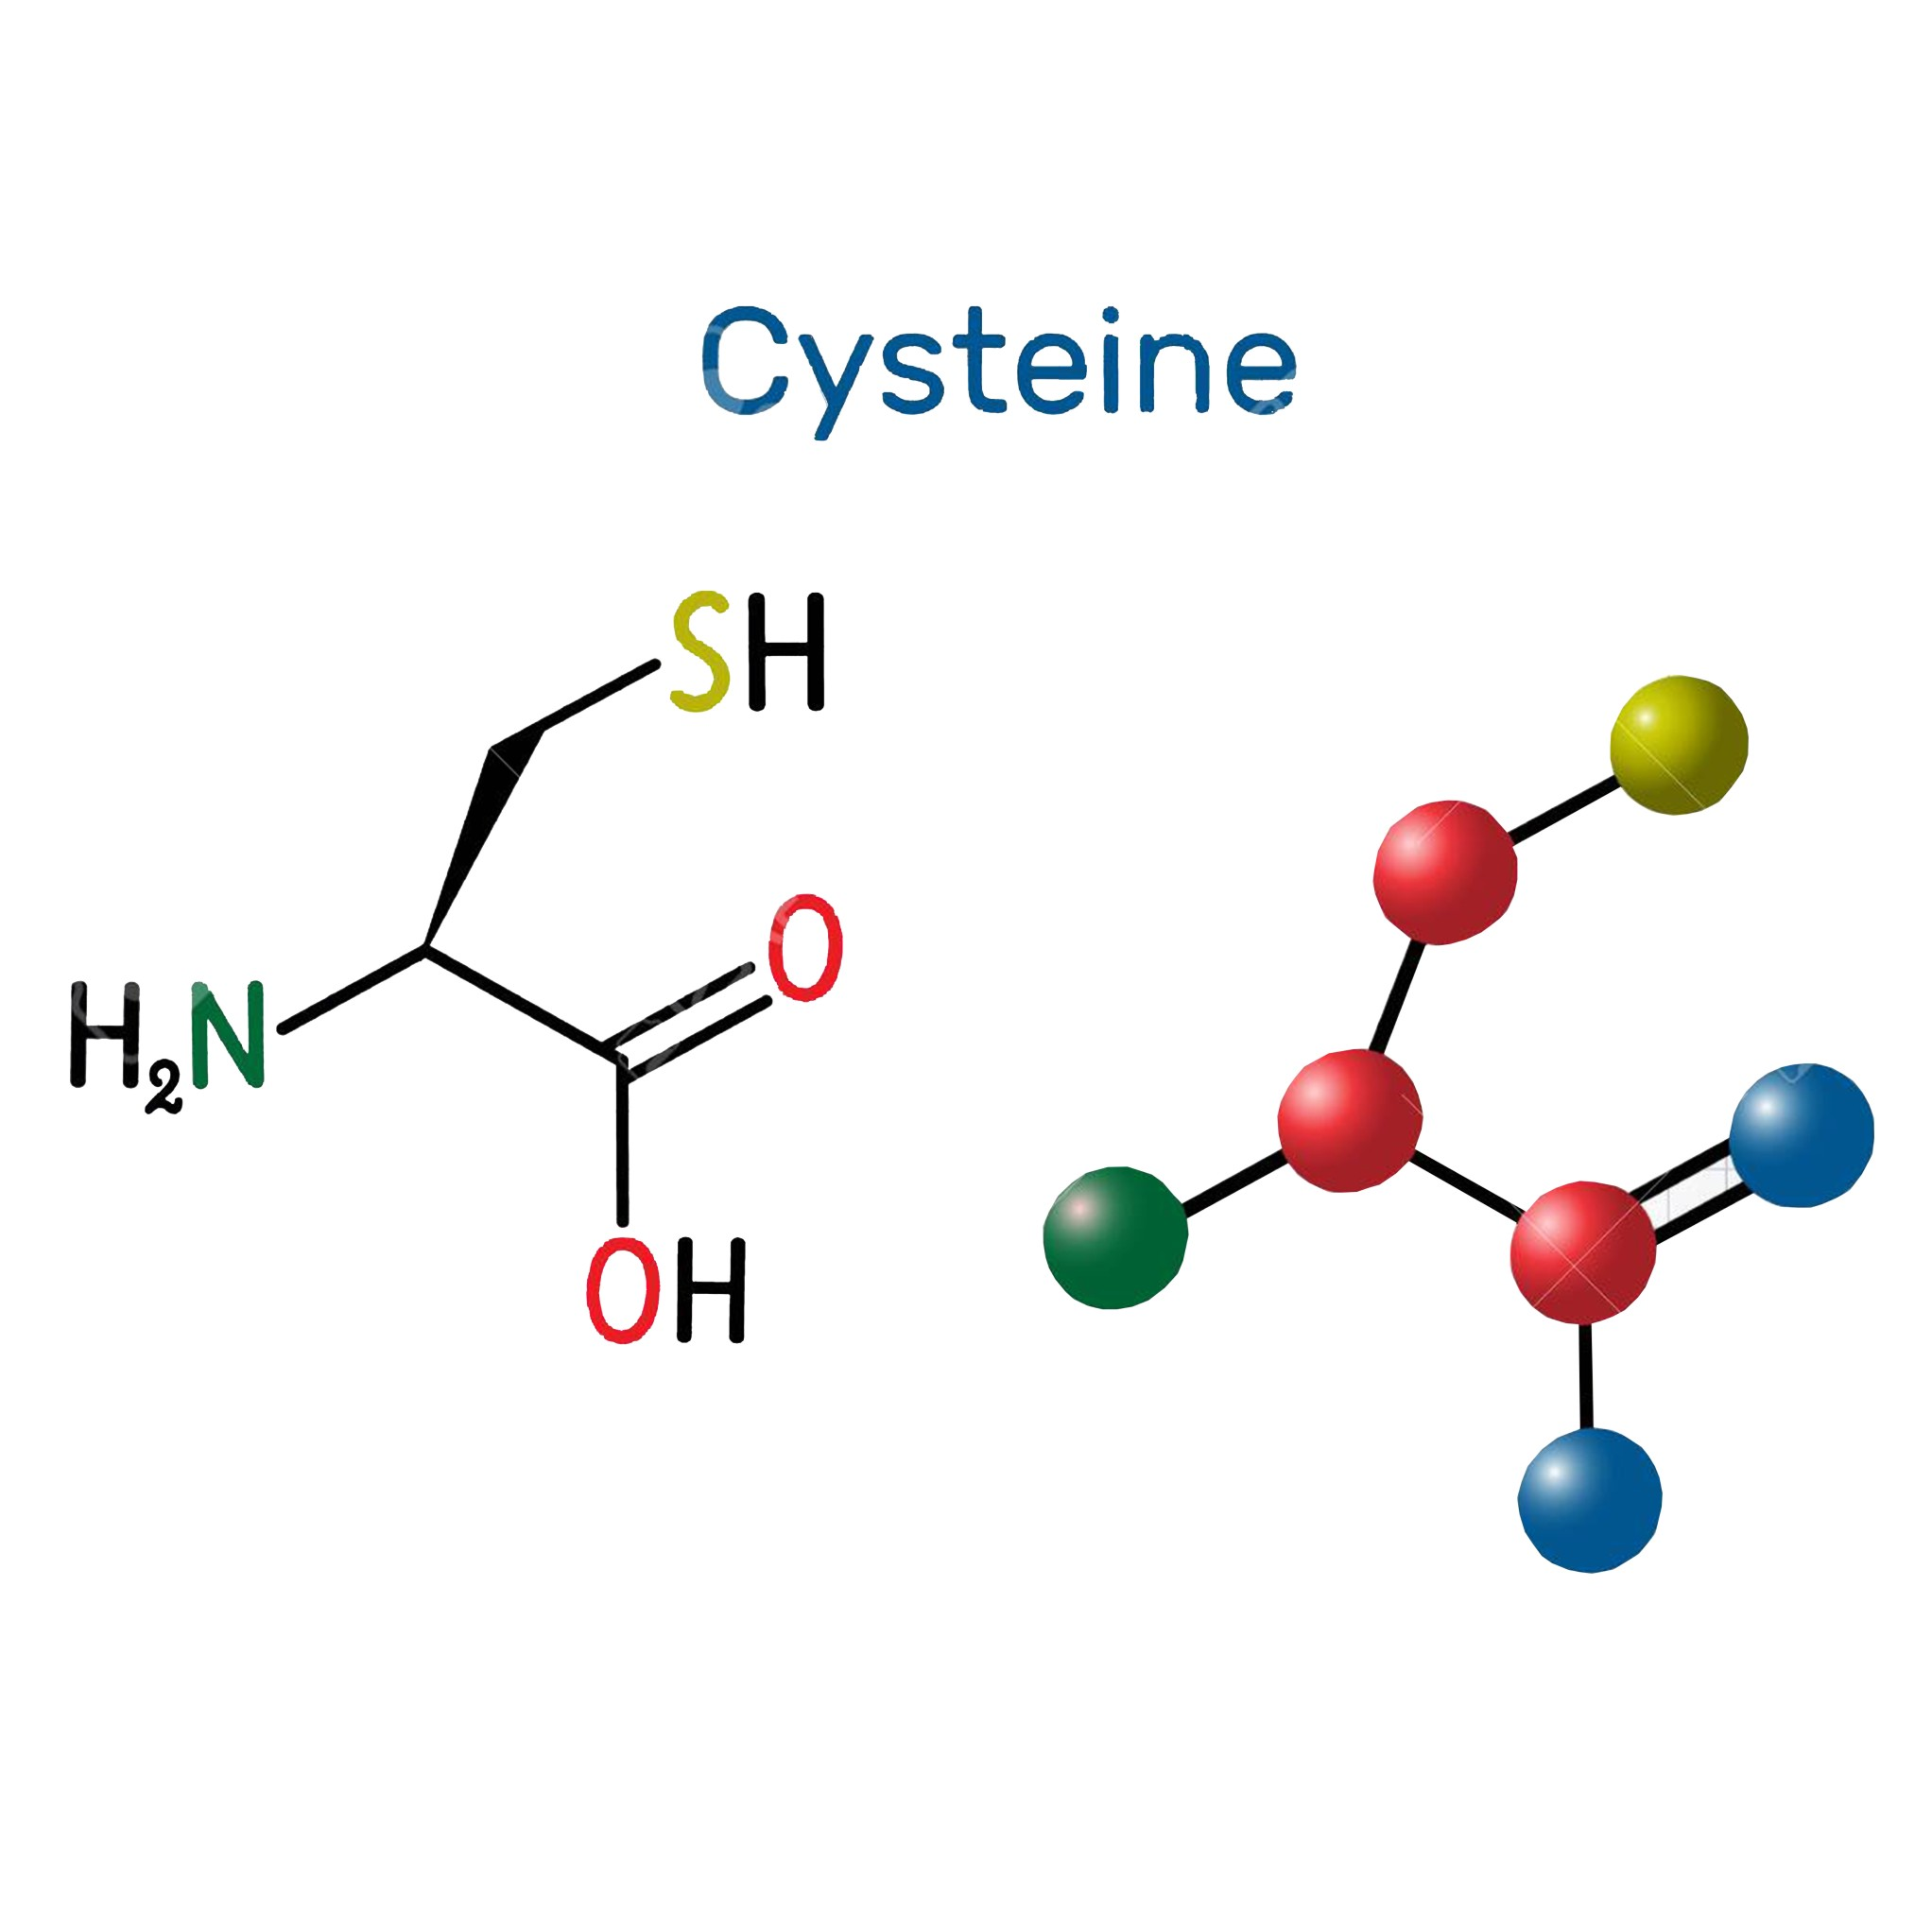 l cysteine structure Image